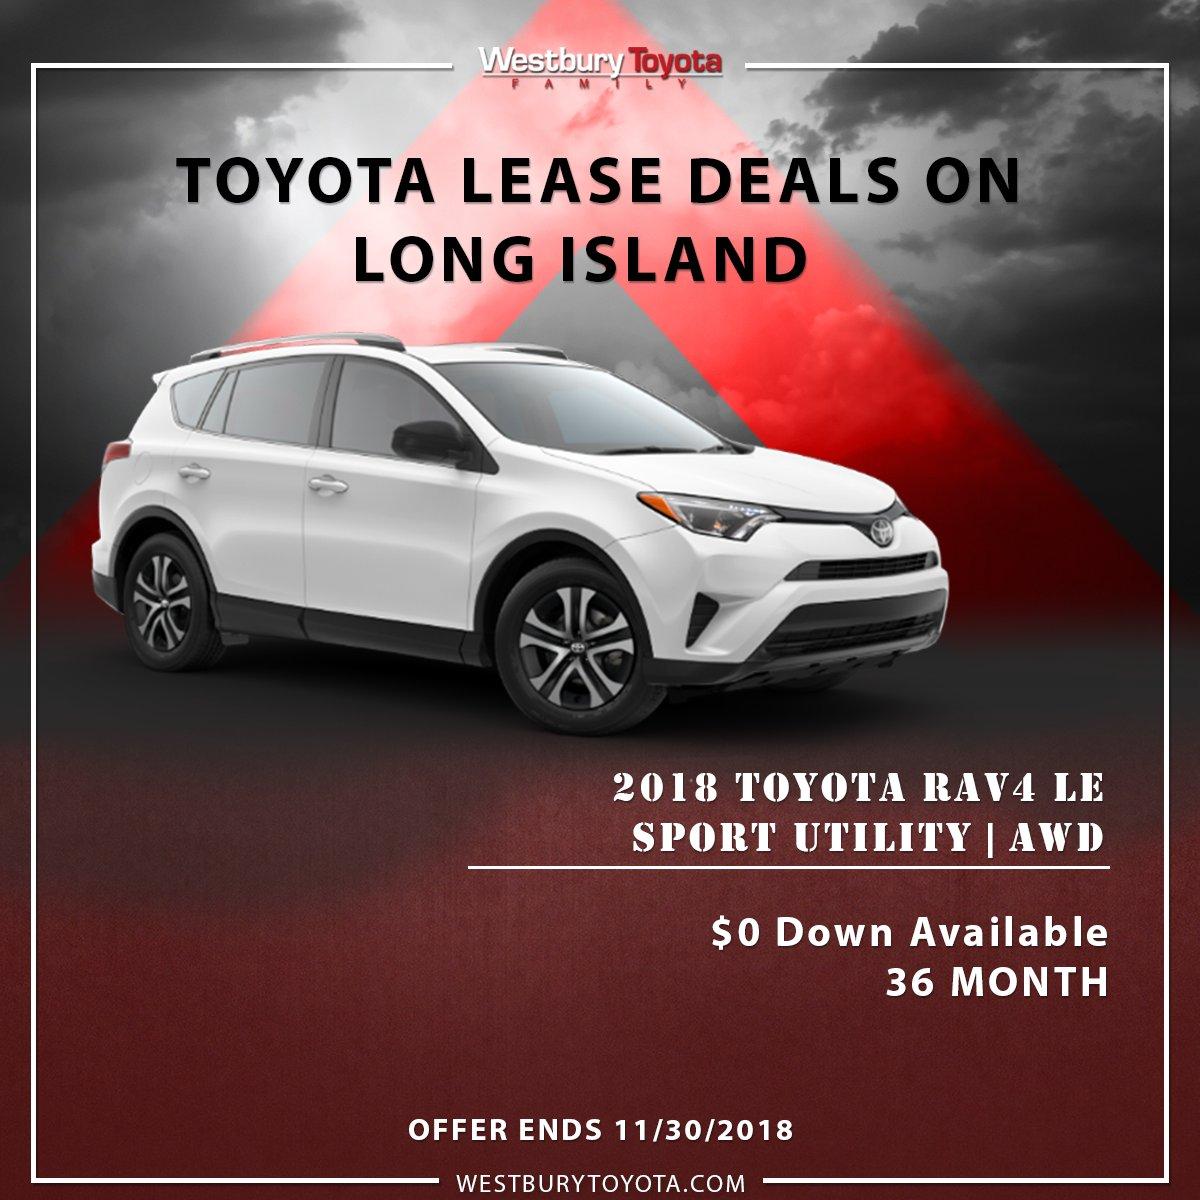 Toyota Rav4 Lease Deals Long Island